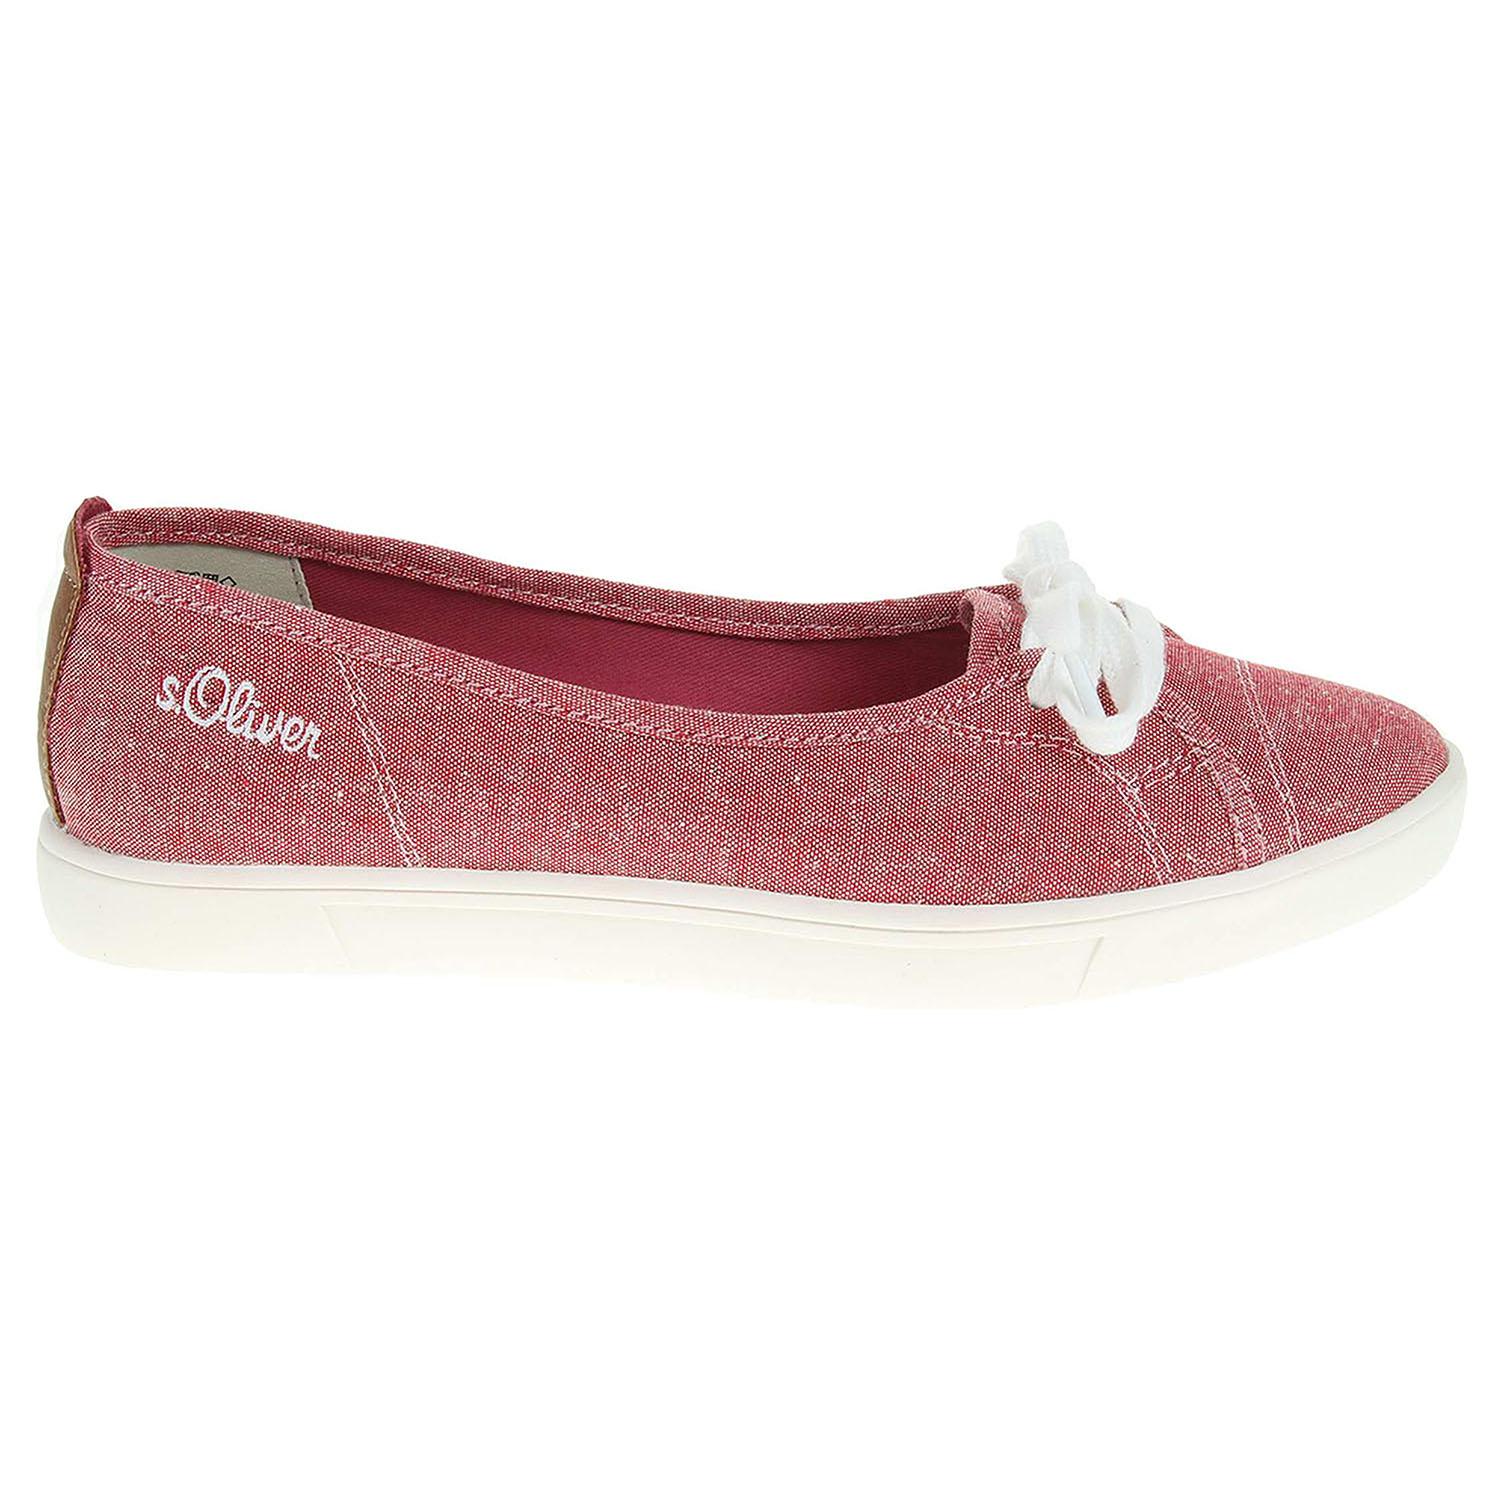 Oliver dámská obuv 5-22131-38 červená 40 df82e482f3